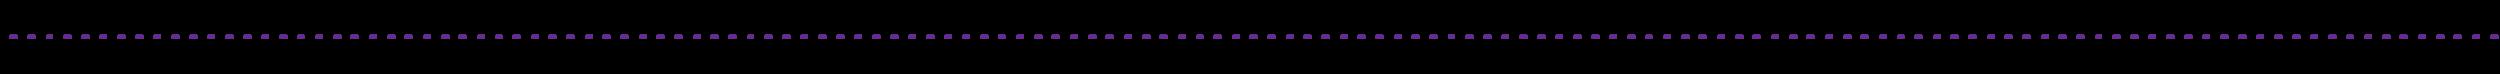 purple-line.png